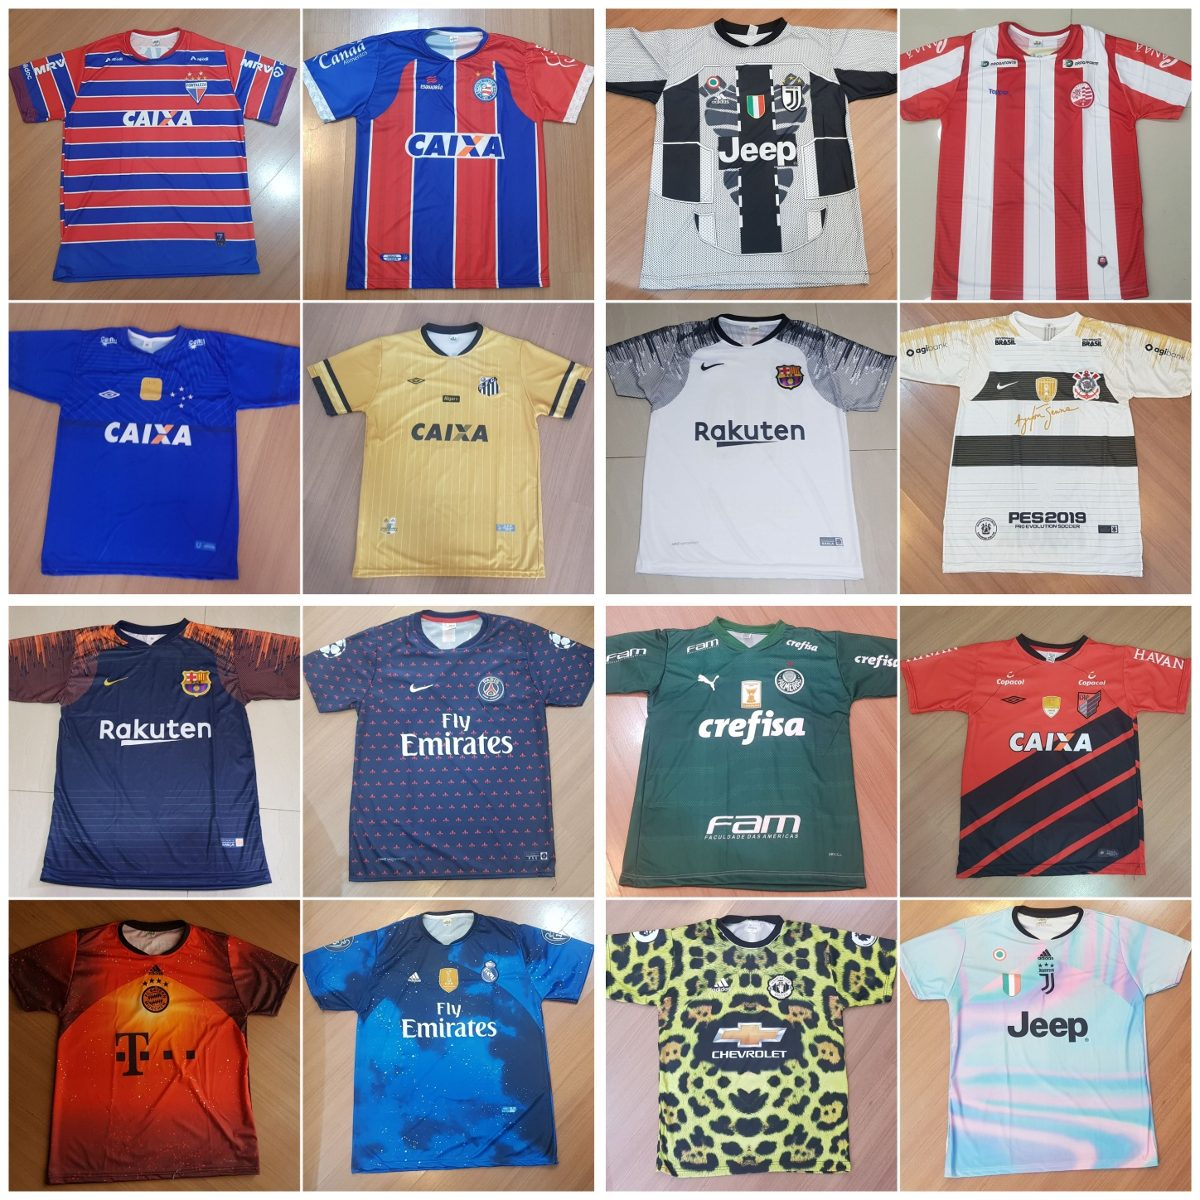 2aa8055fec8b5 camisetas de times de futebol 10 unidades. Carregando zoom.